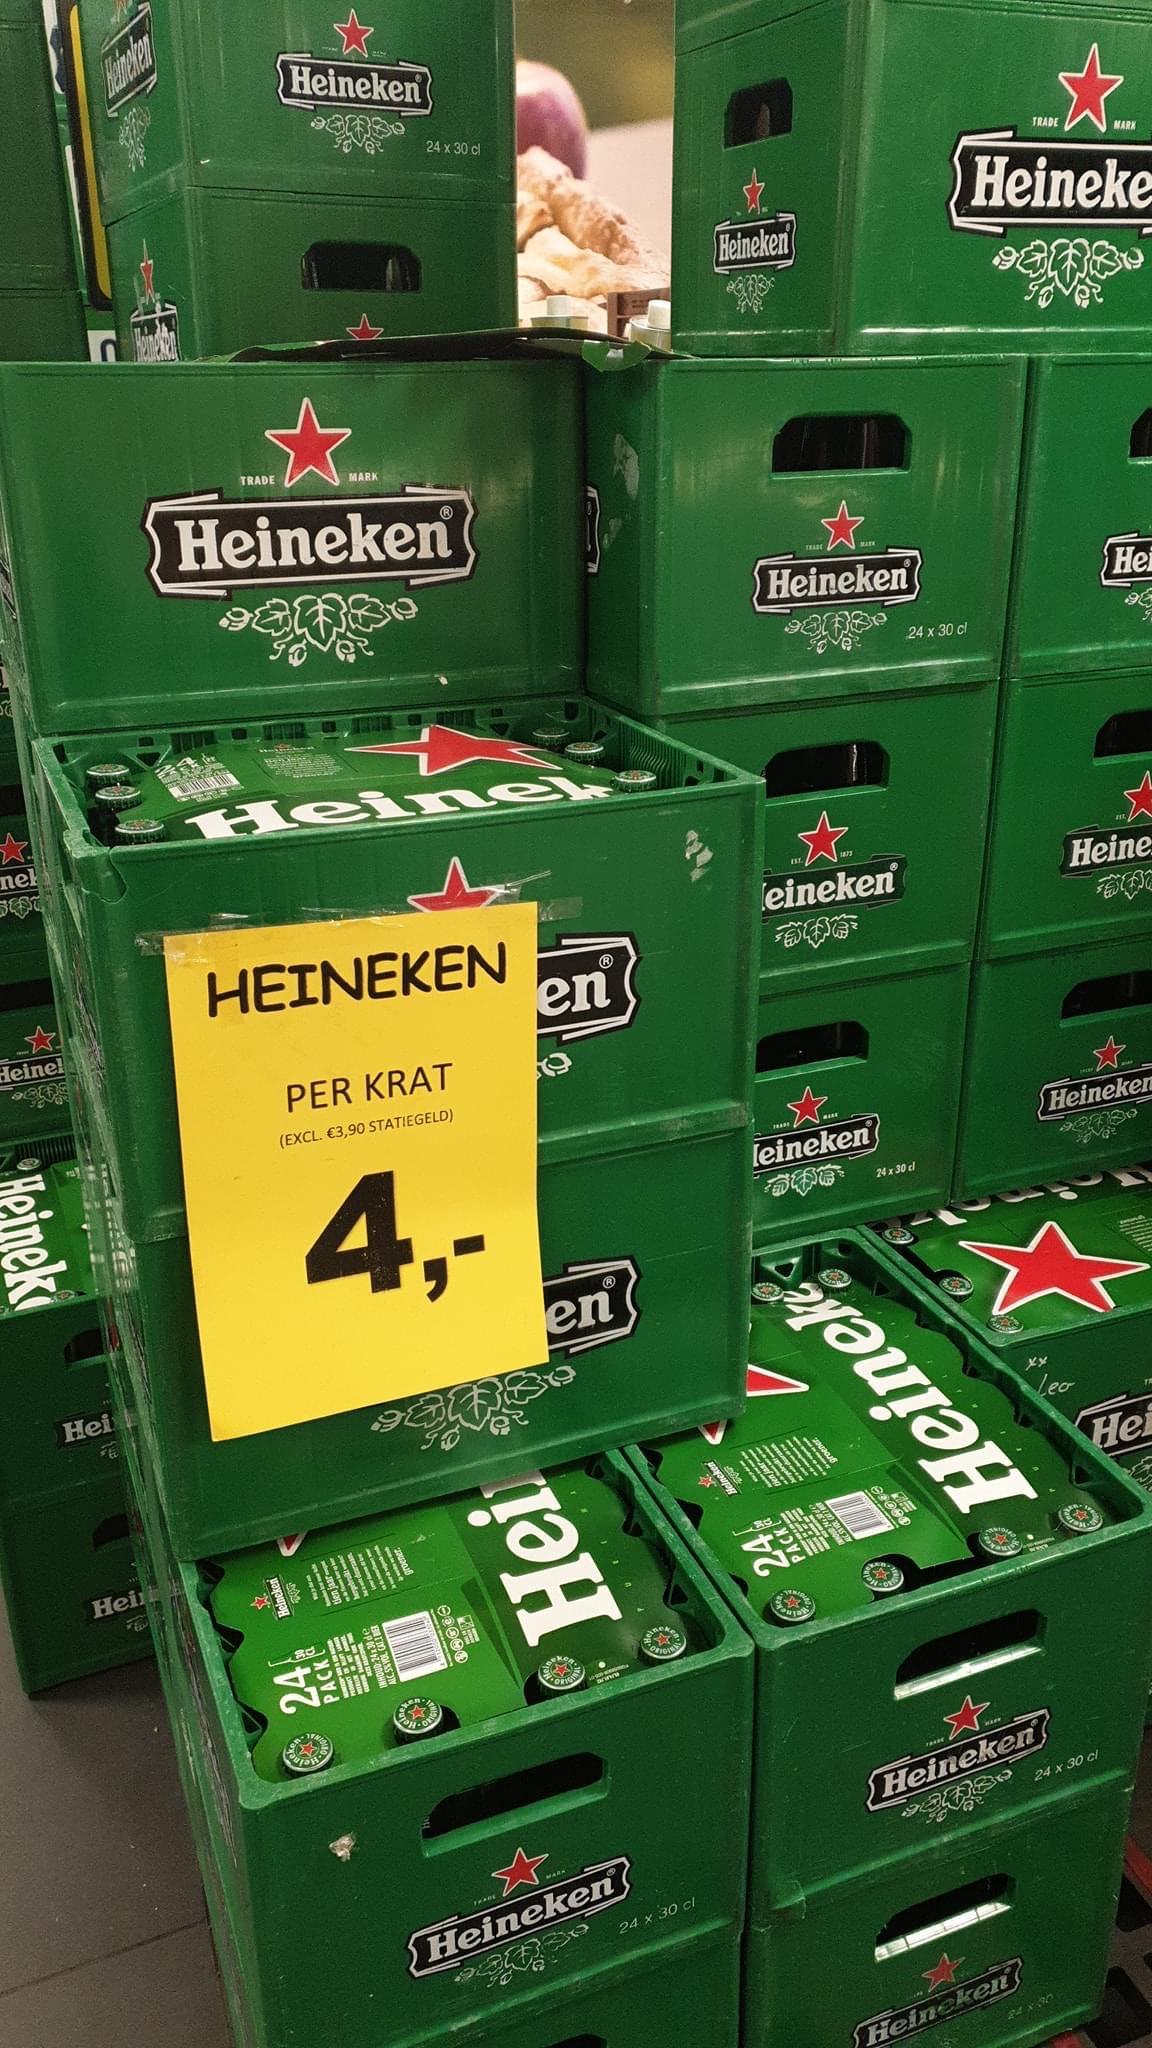 Heineken 4 euro per krat